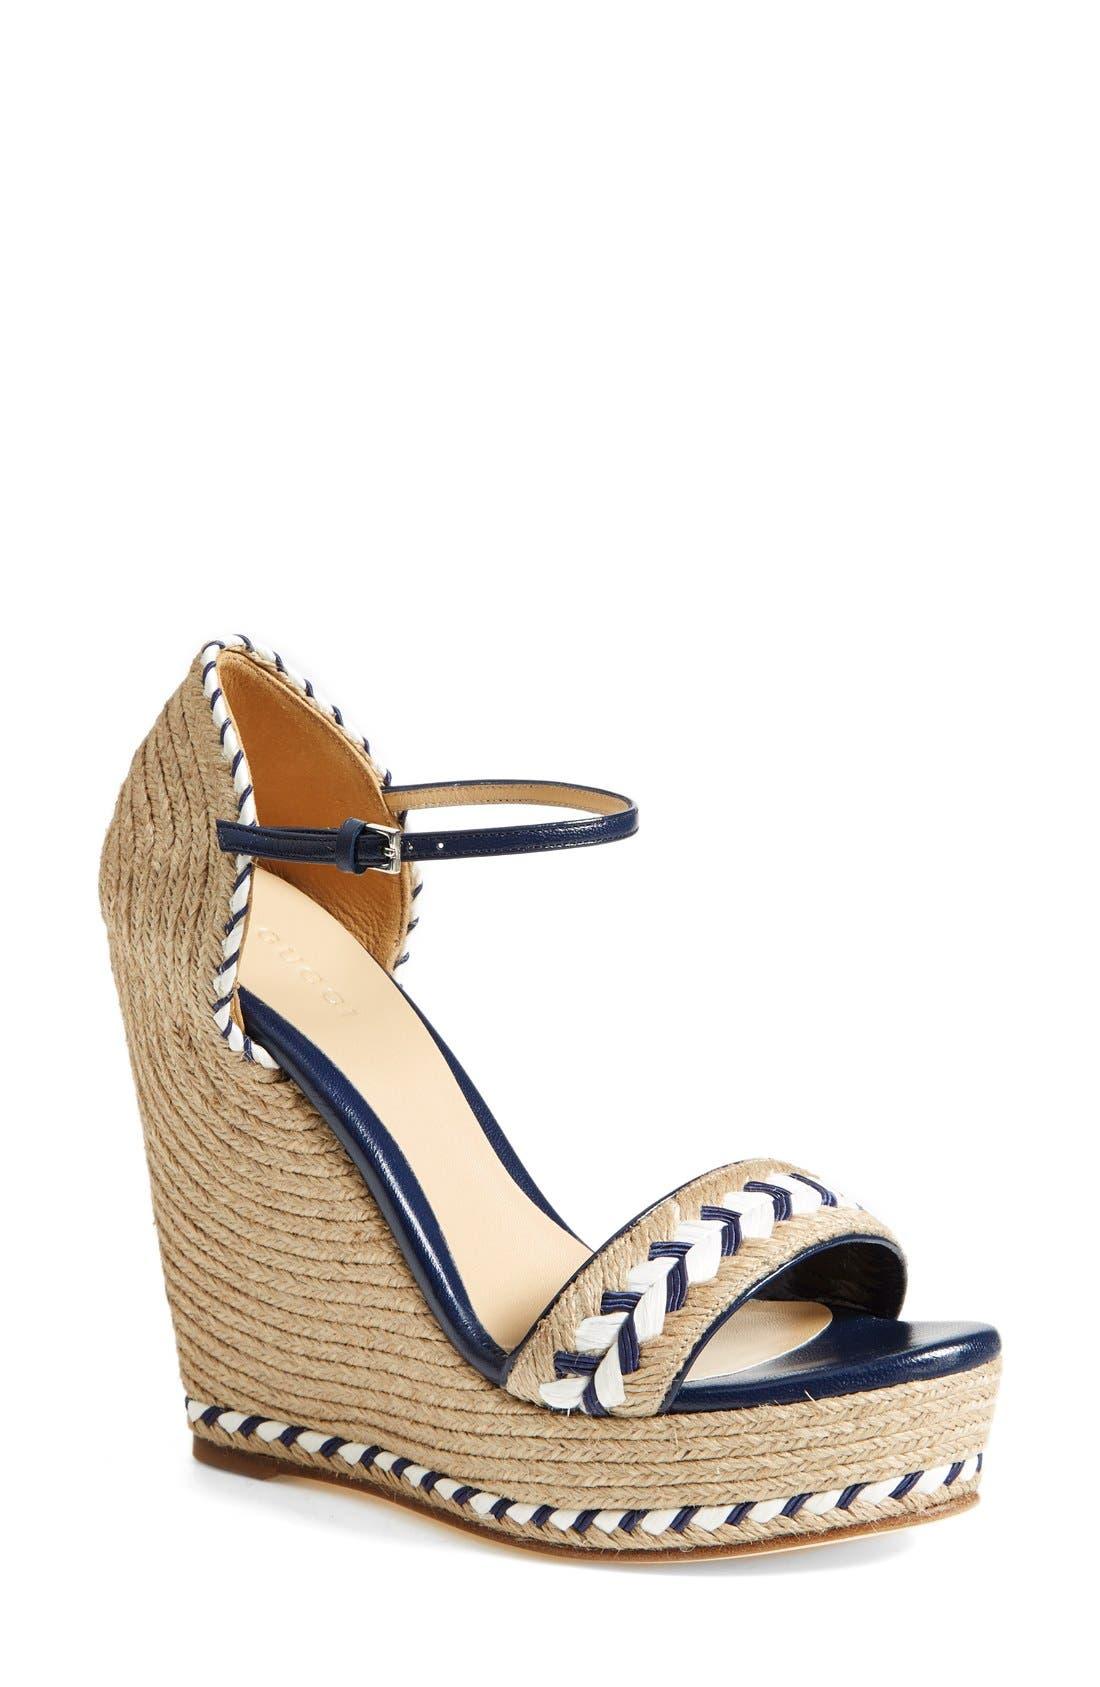 Main Image - Gucci 'Tiffany' Wedge Sandal (Women)